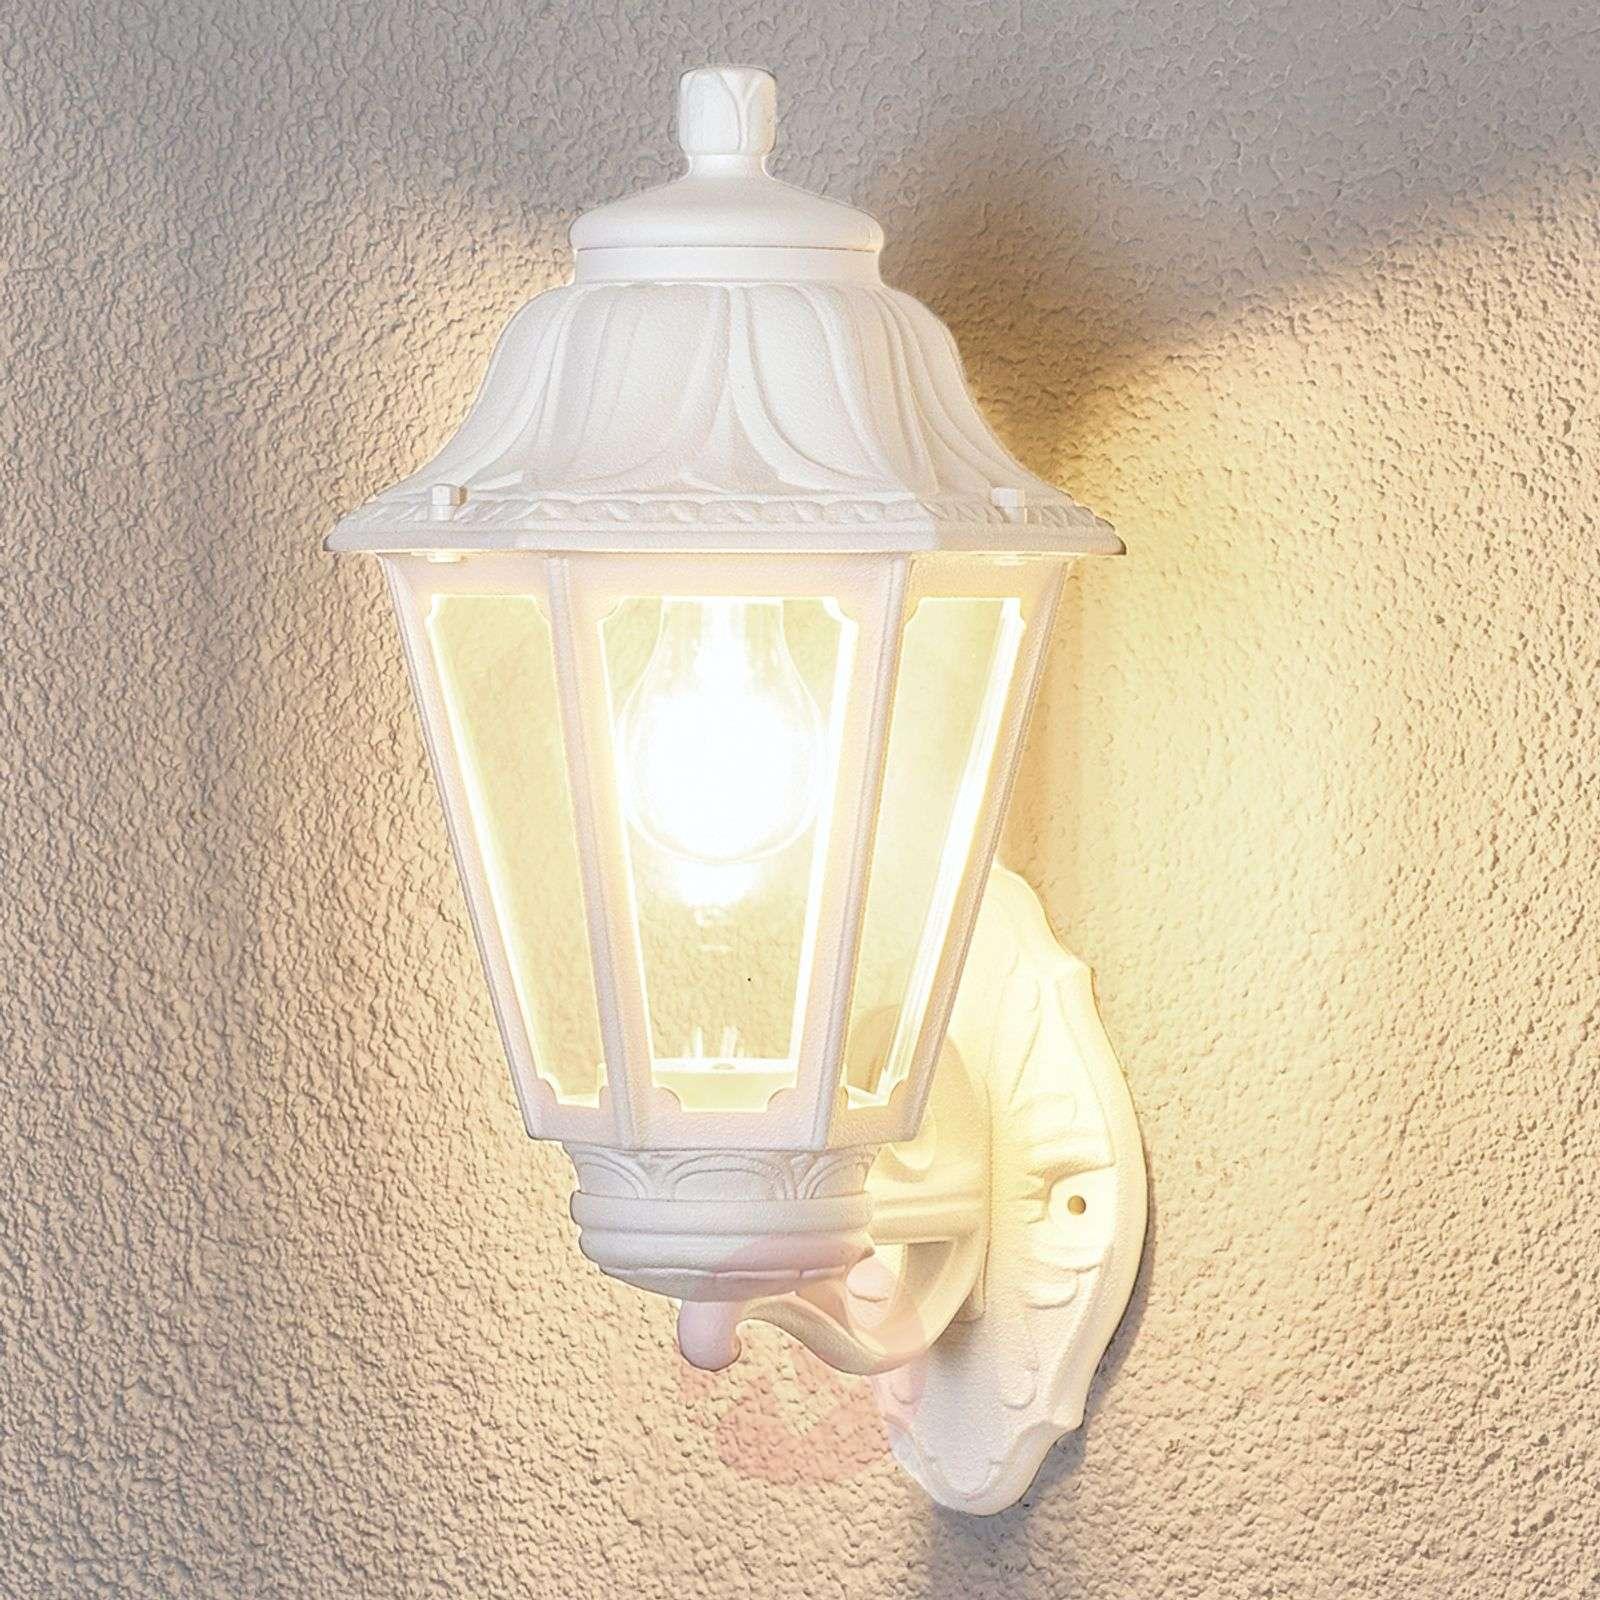 LED-ulkovalo Bisso Anna valkoinen ylösvalaiseva-3538047-01